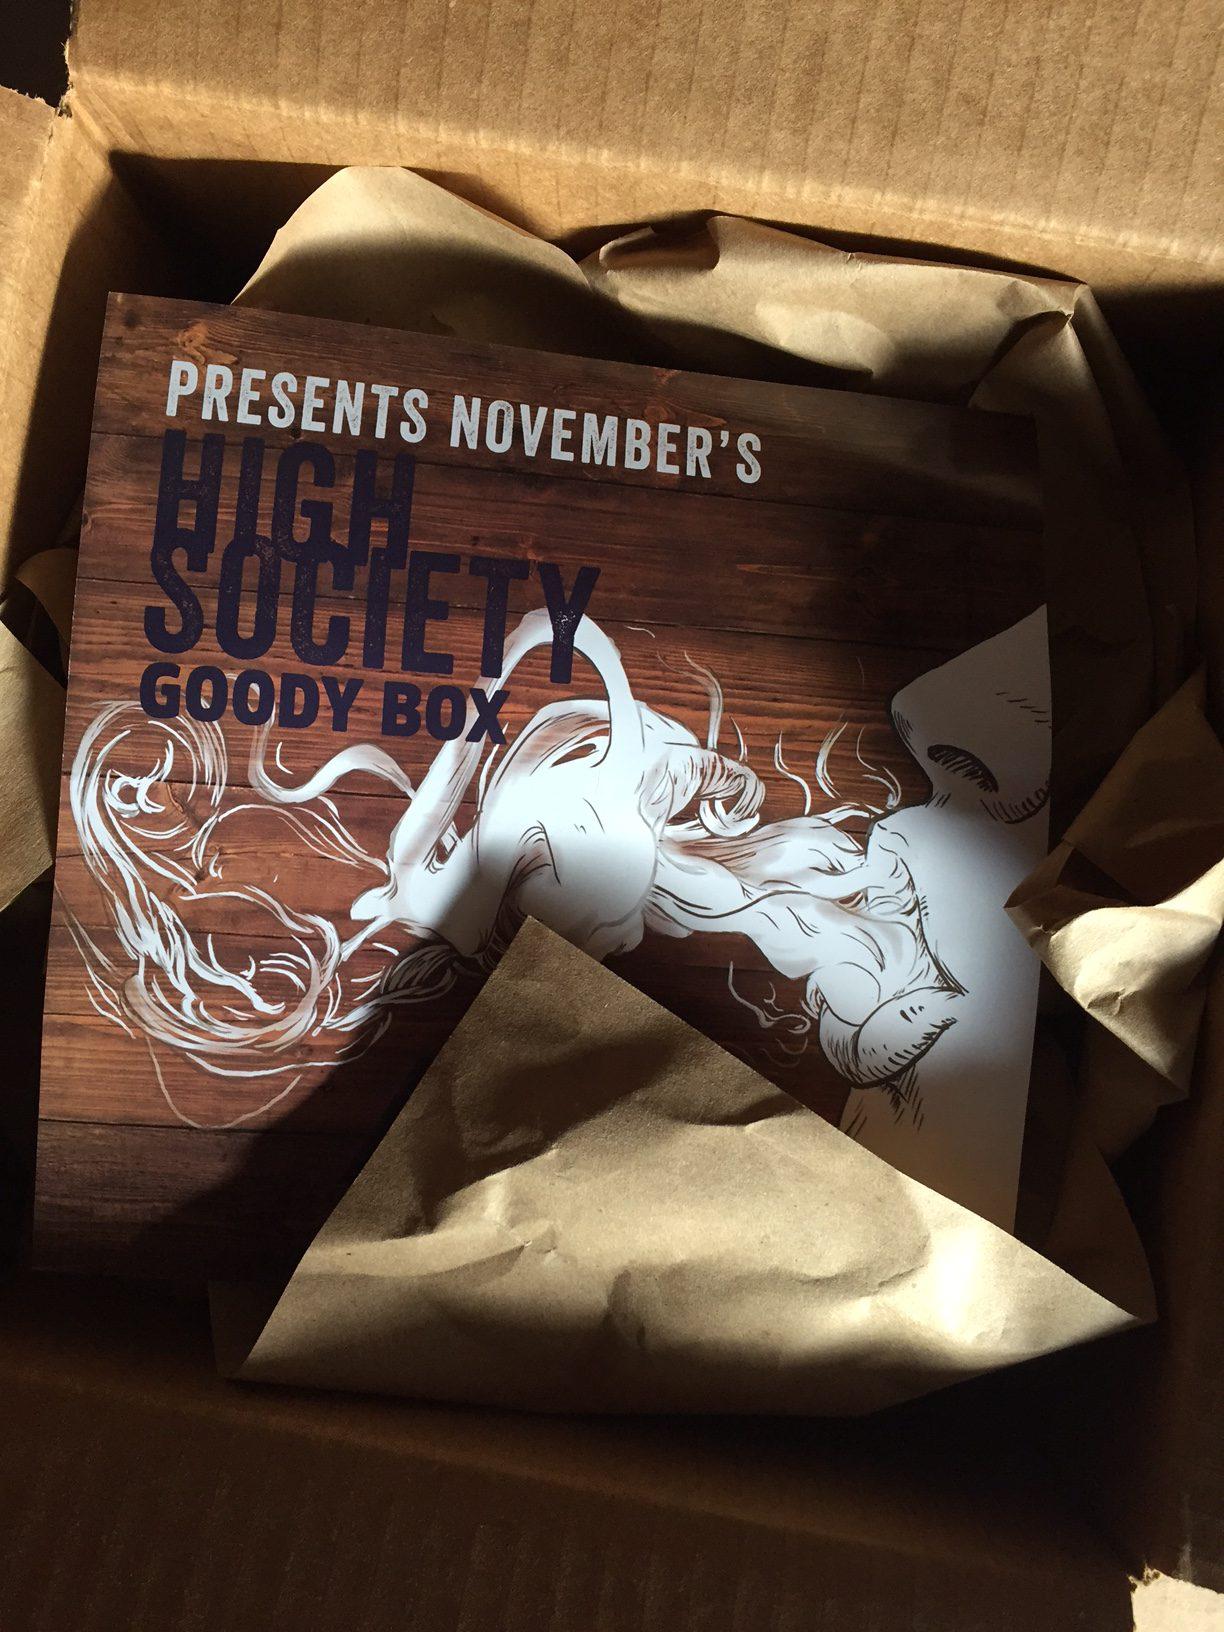 420 Goody Box November